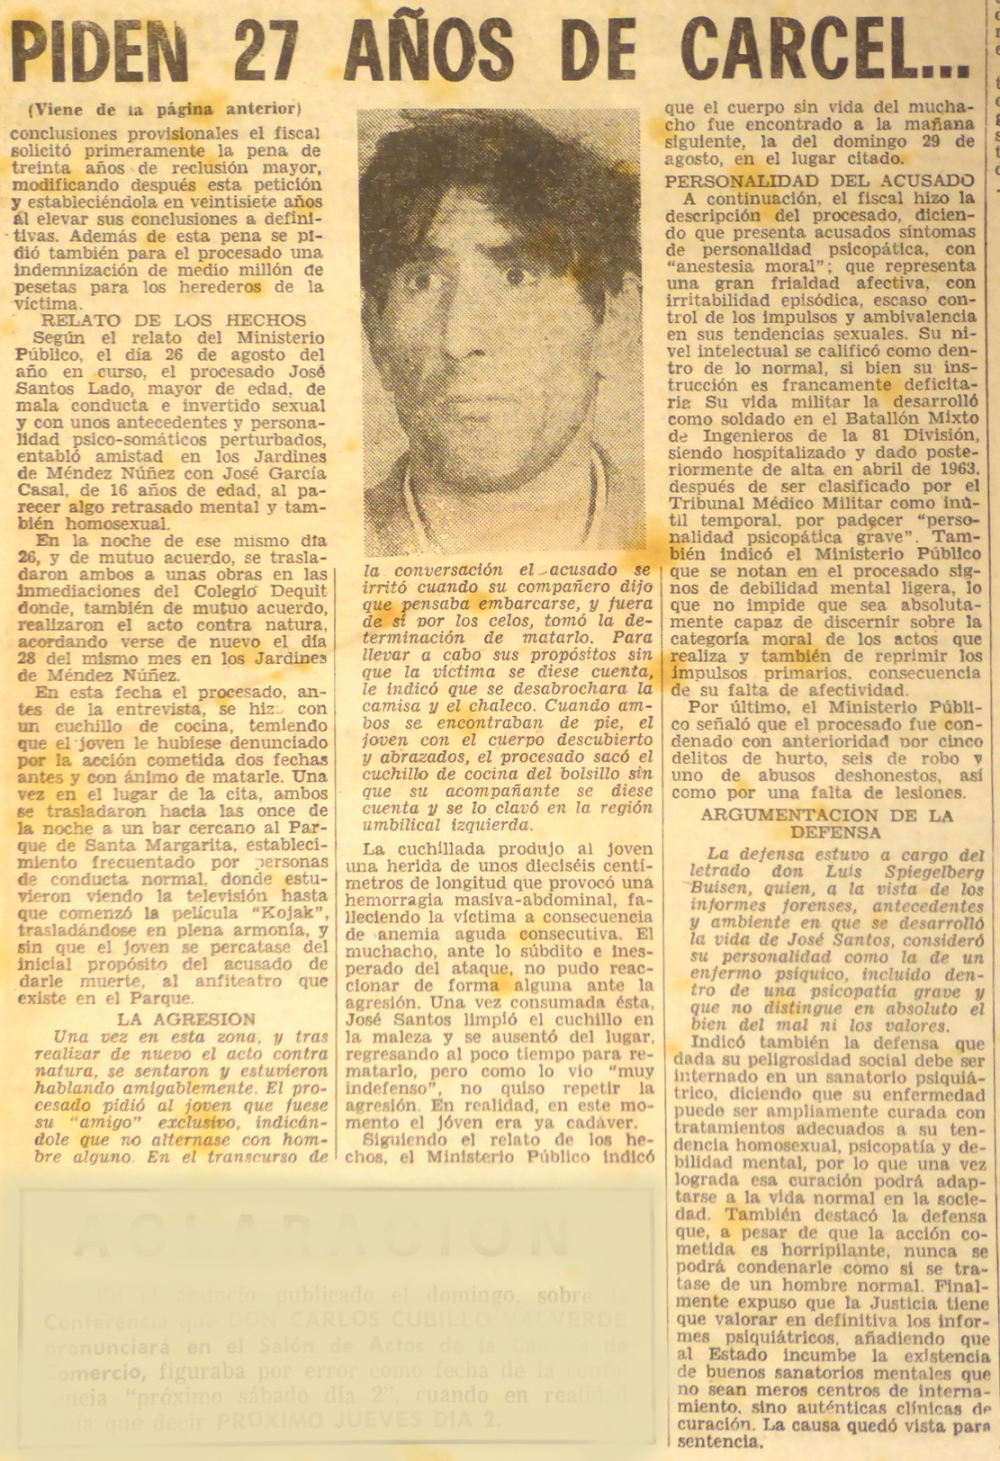 1976-11-30-el-ideal-g-homosexual-asesino-2